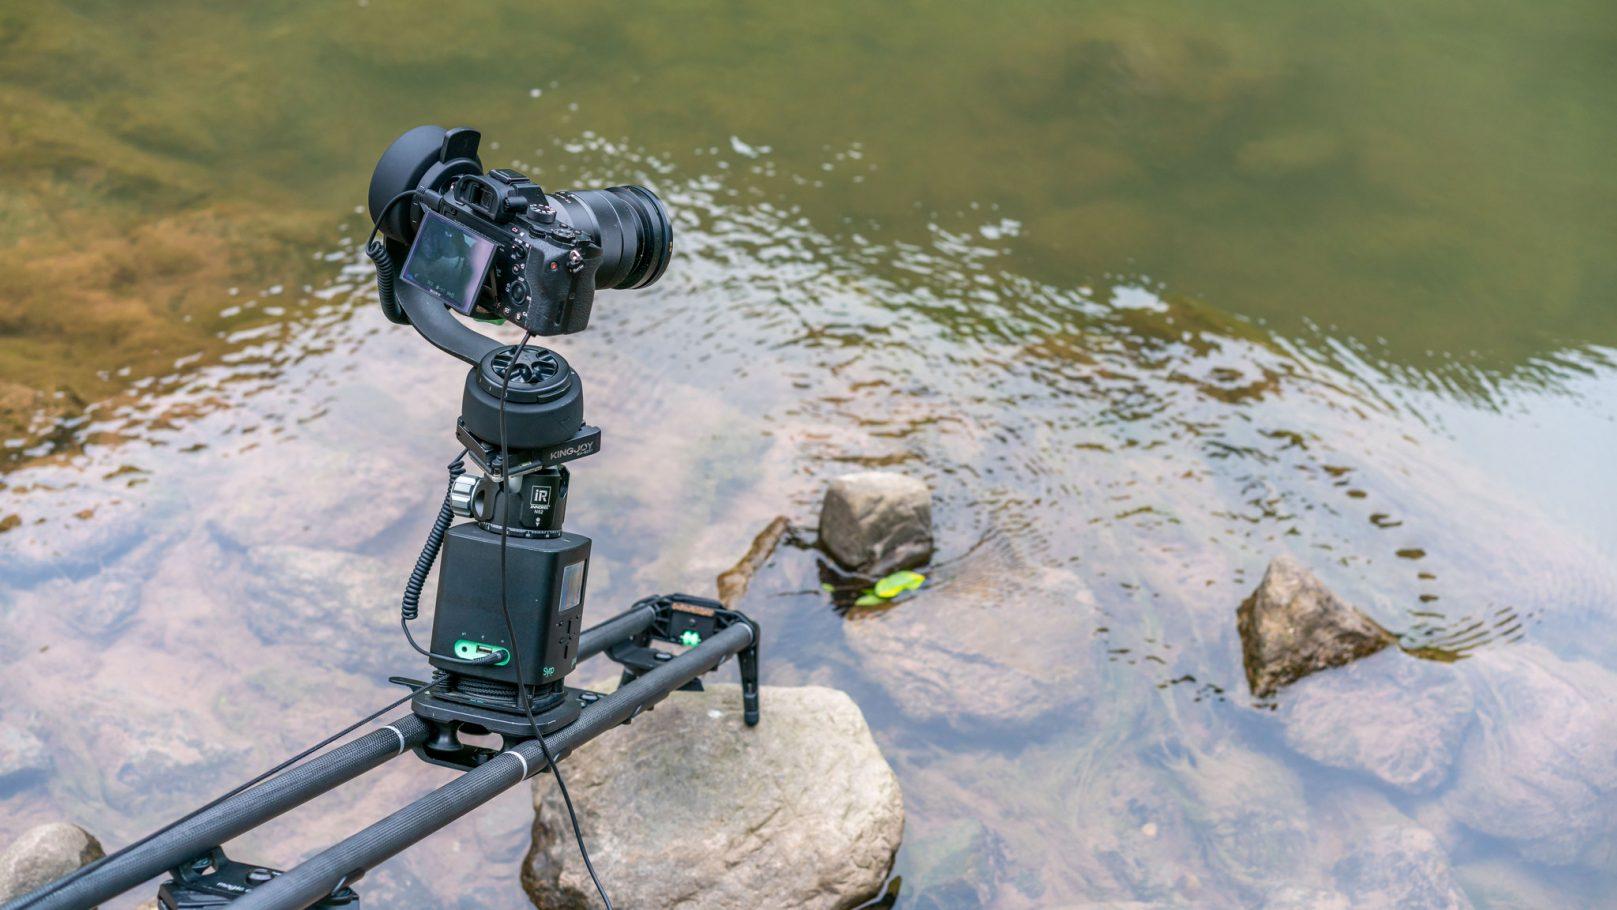 Syrp三轴延时摄影电控系统-郎酒项目-赤水河